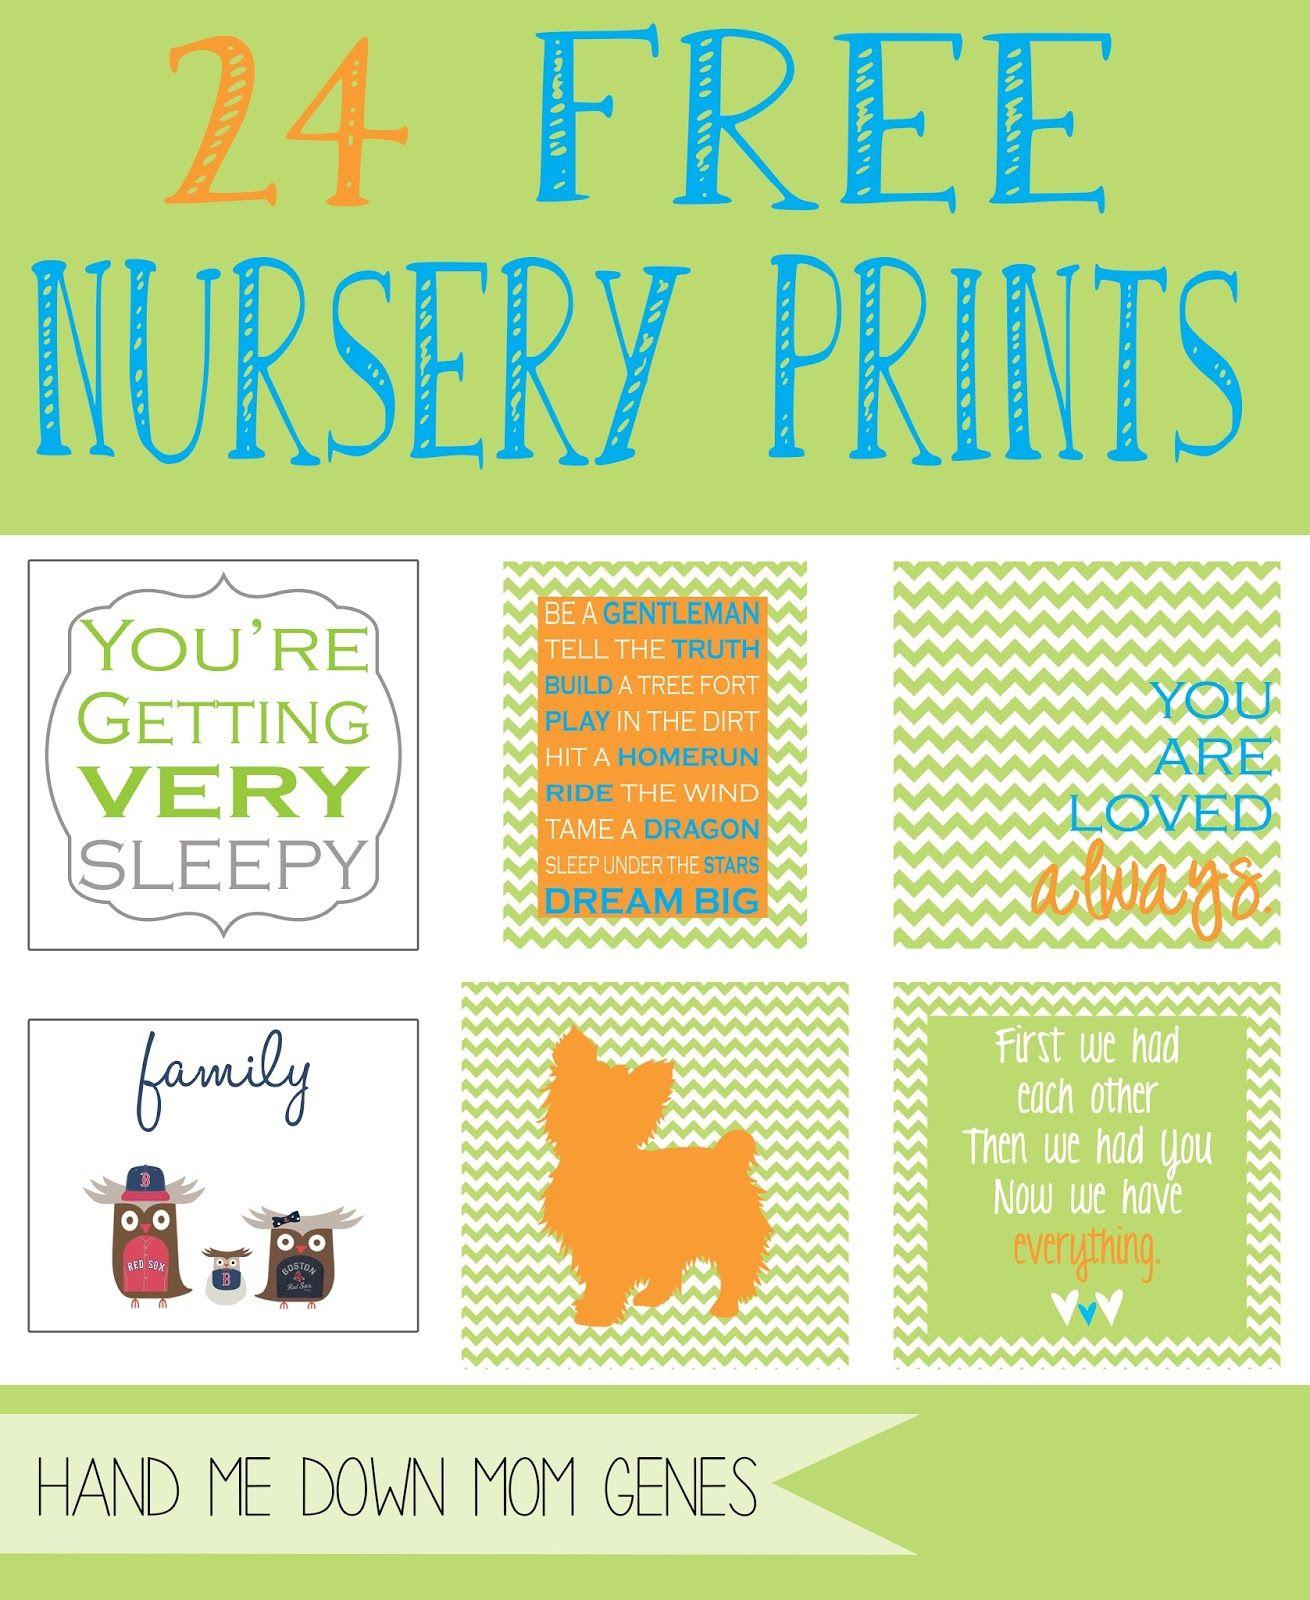 Hand Me Down Mom Genes: Free Nursery Prints Pt. 2 | Home Management ...